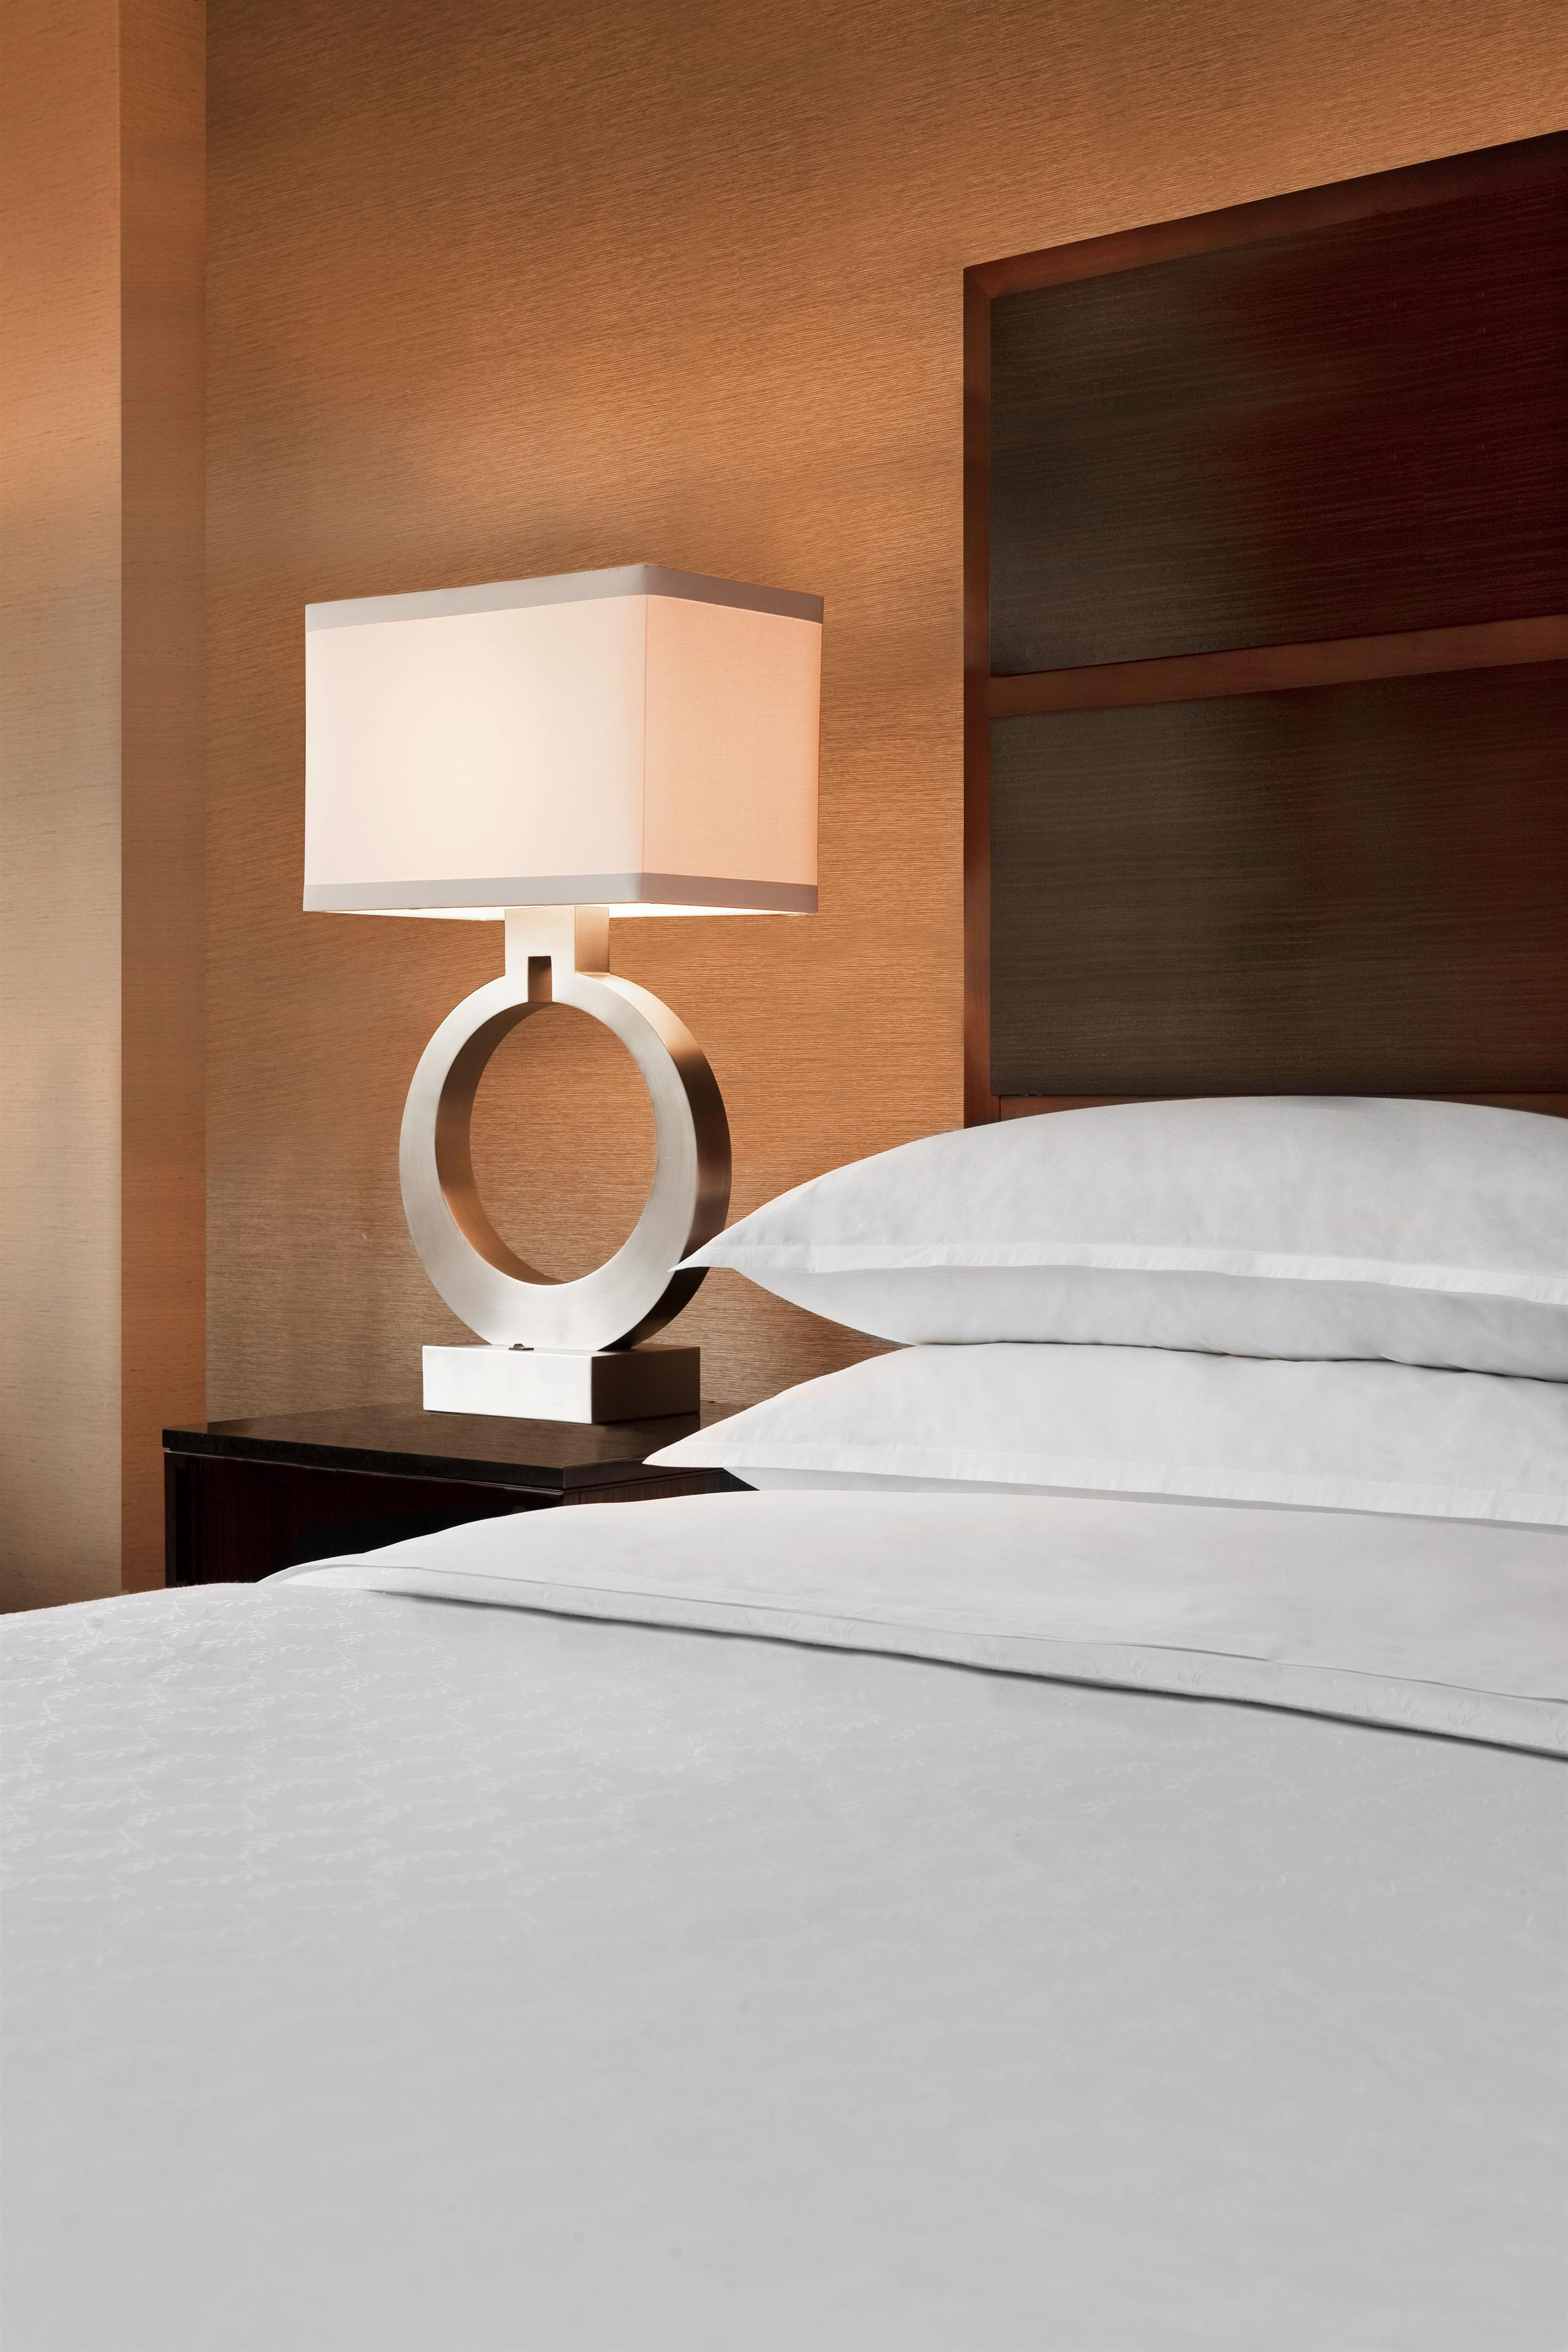 Sheraton New York Times Square Hotel image 7